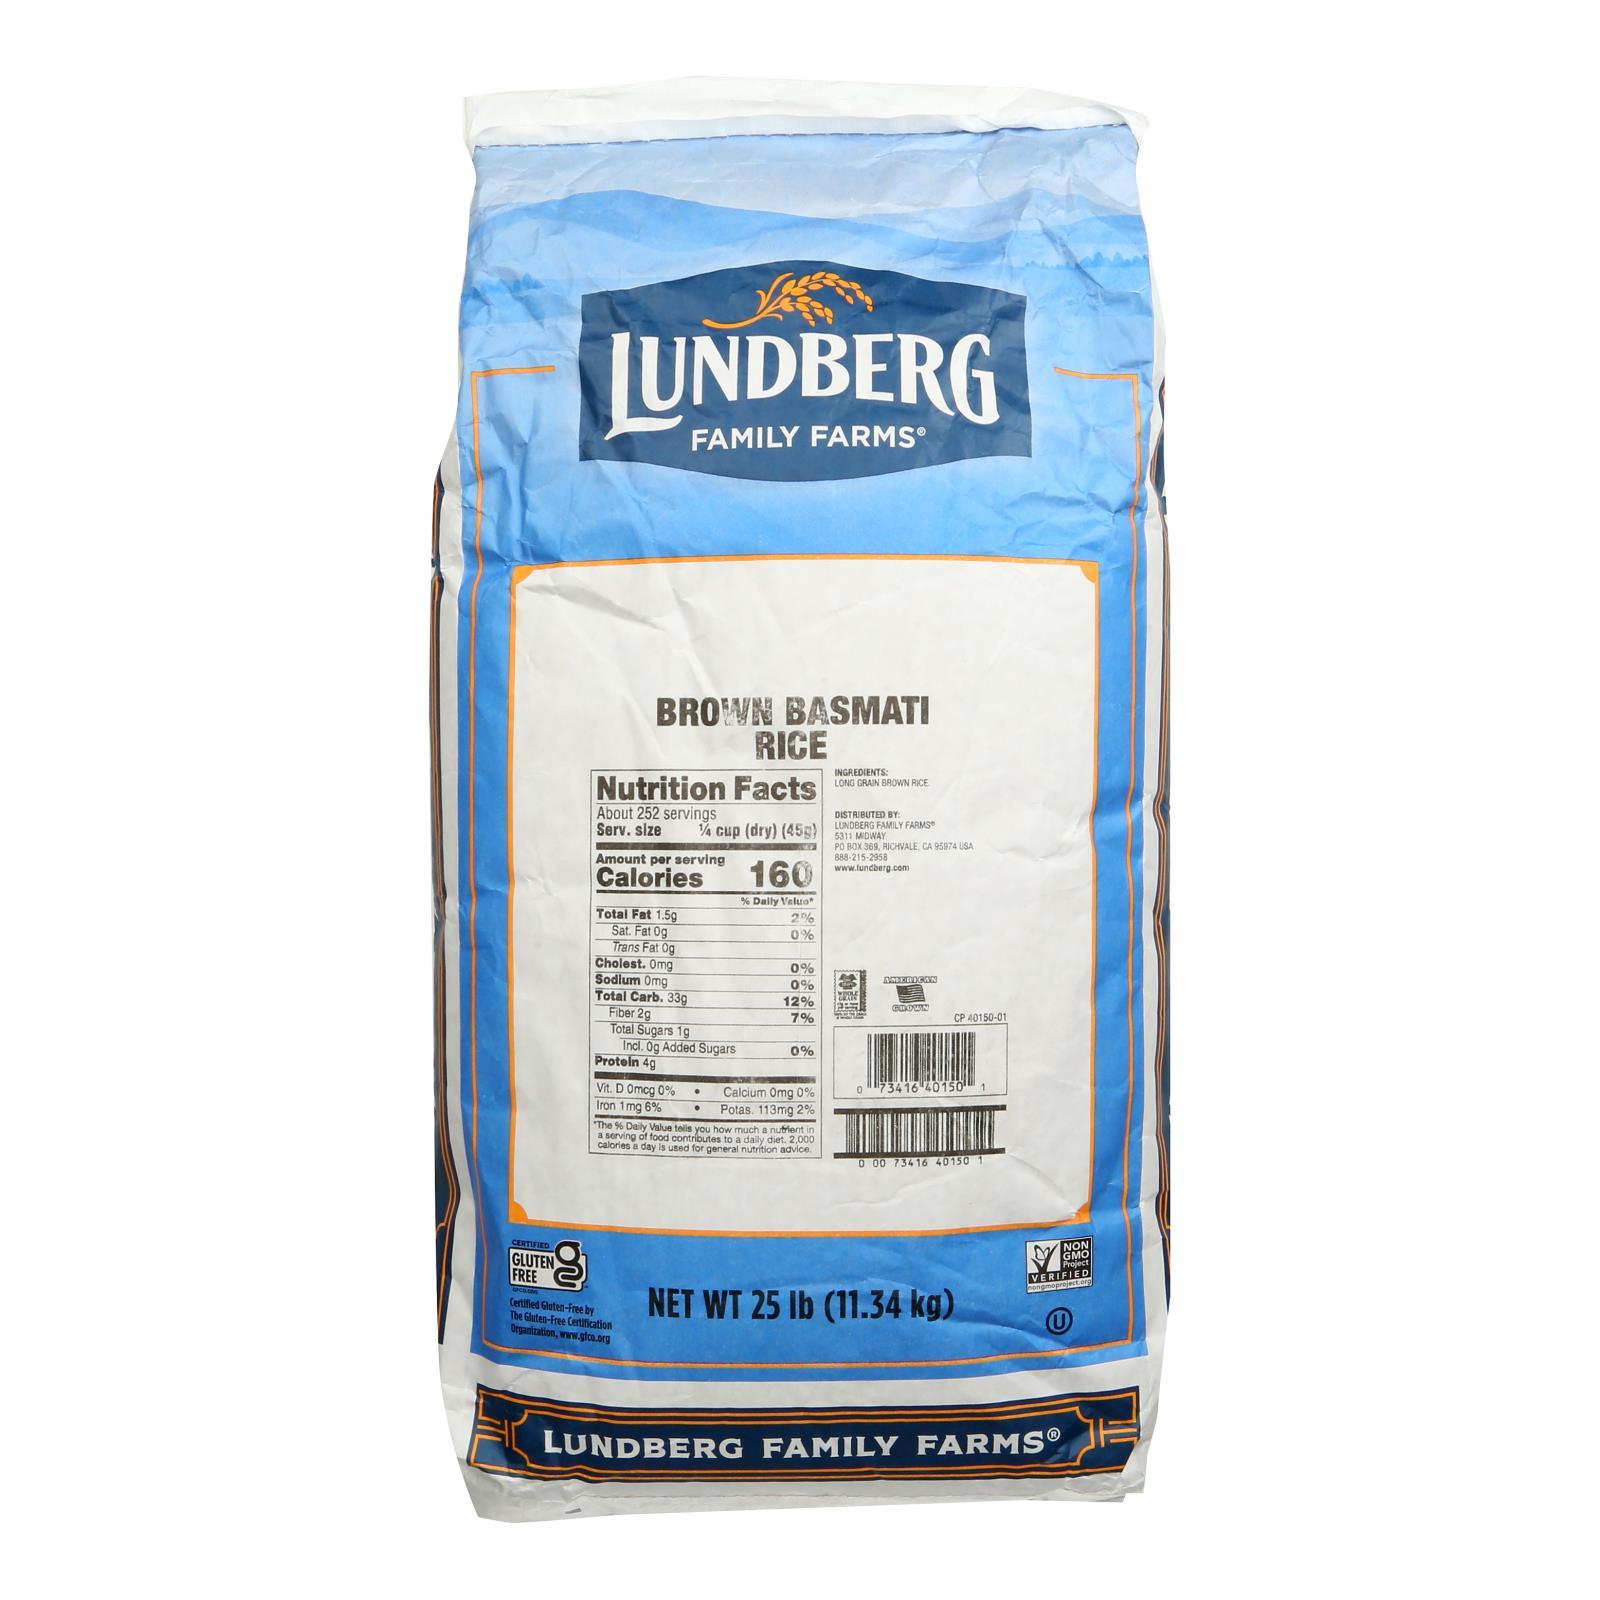 Lundberg Family Farms Brown Basmati Rice - Case of 25 lbs